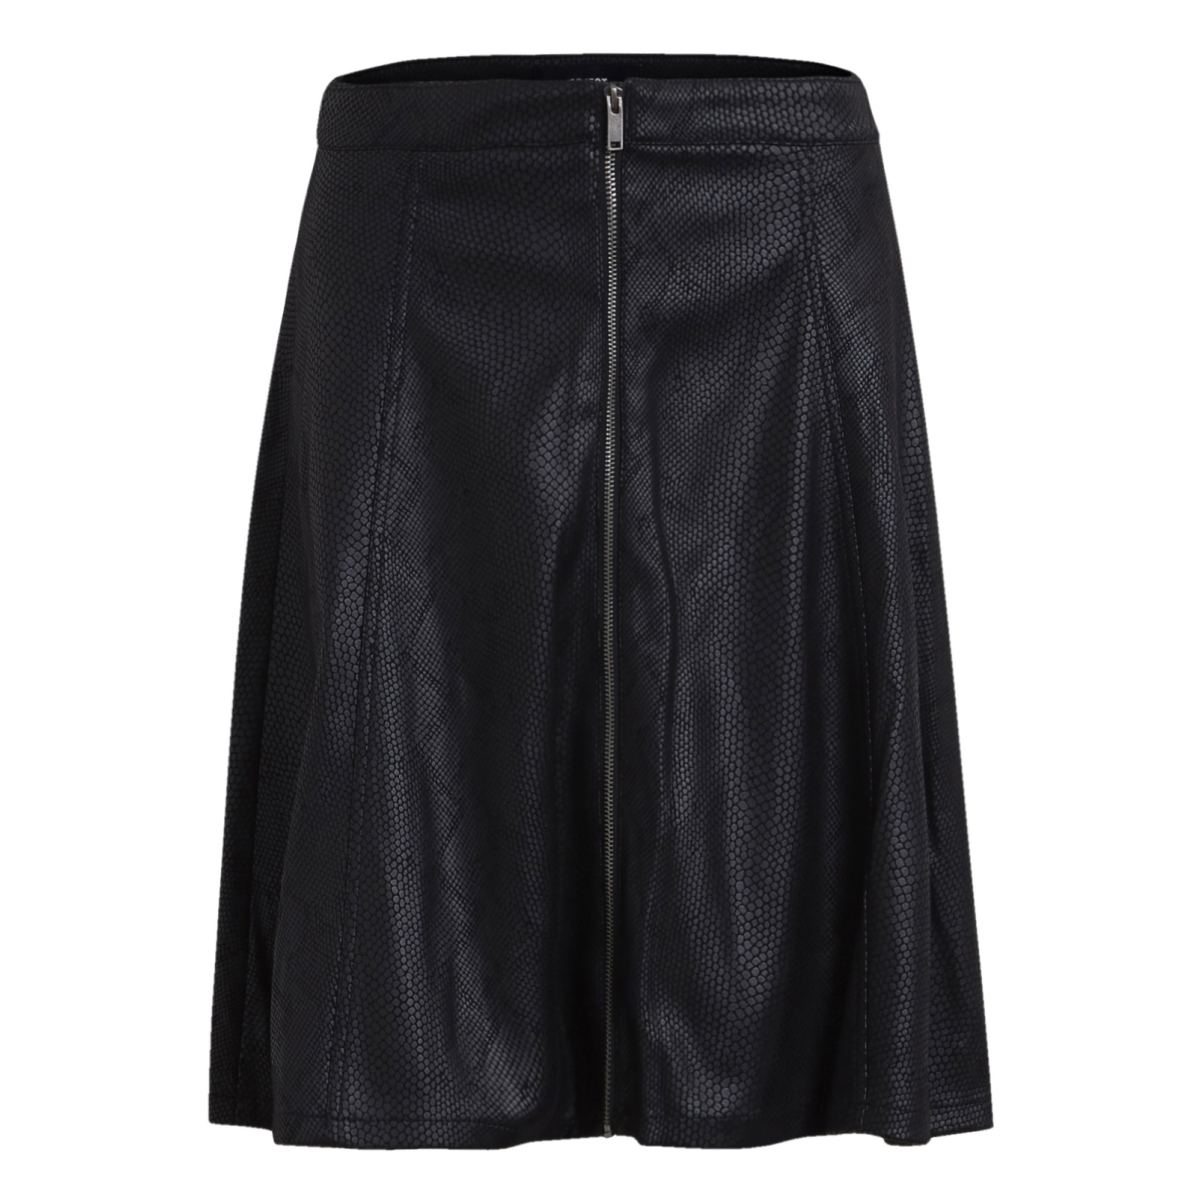 objmarlon mw skirt 93 23025180 object rok black